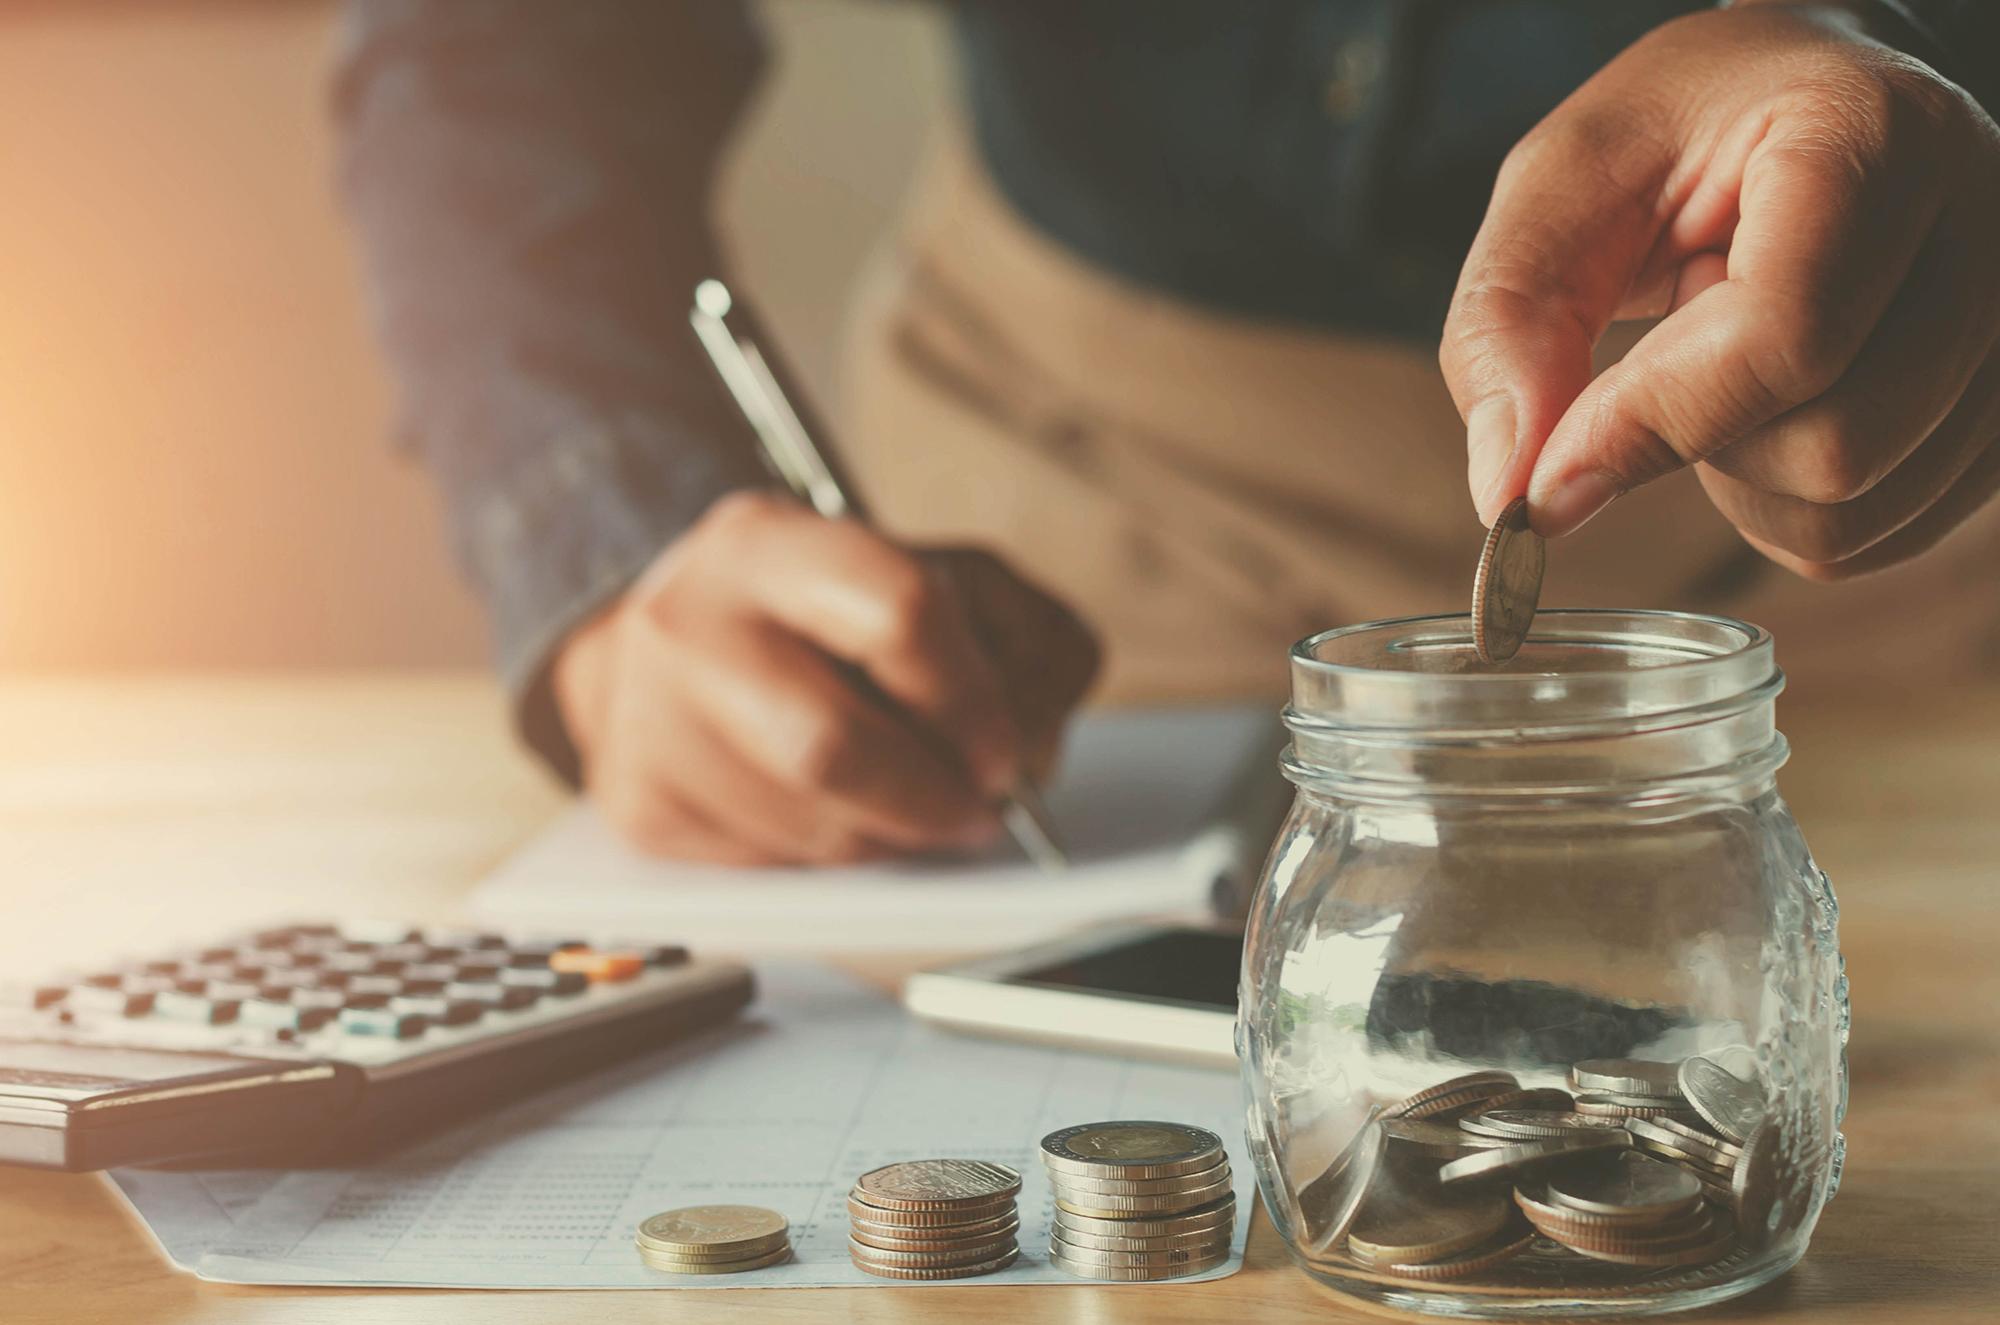 Man saving money. (Image: Shutterstock)